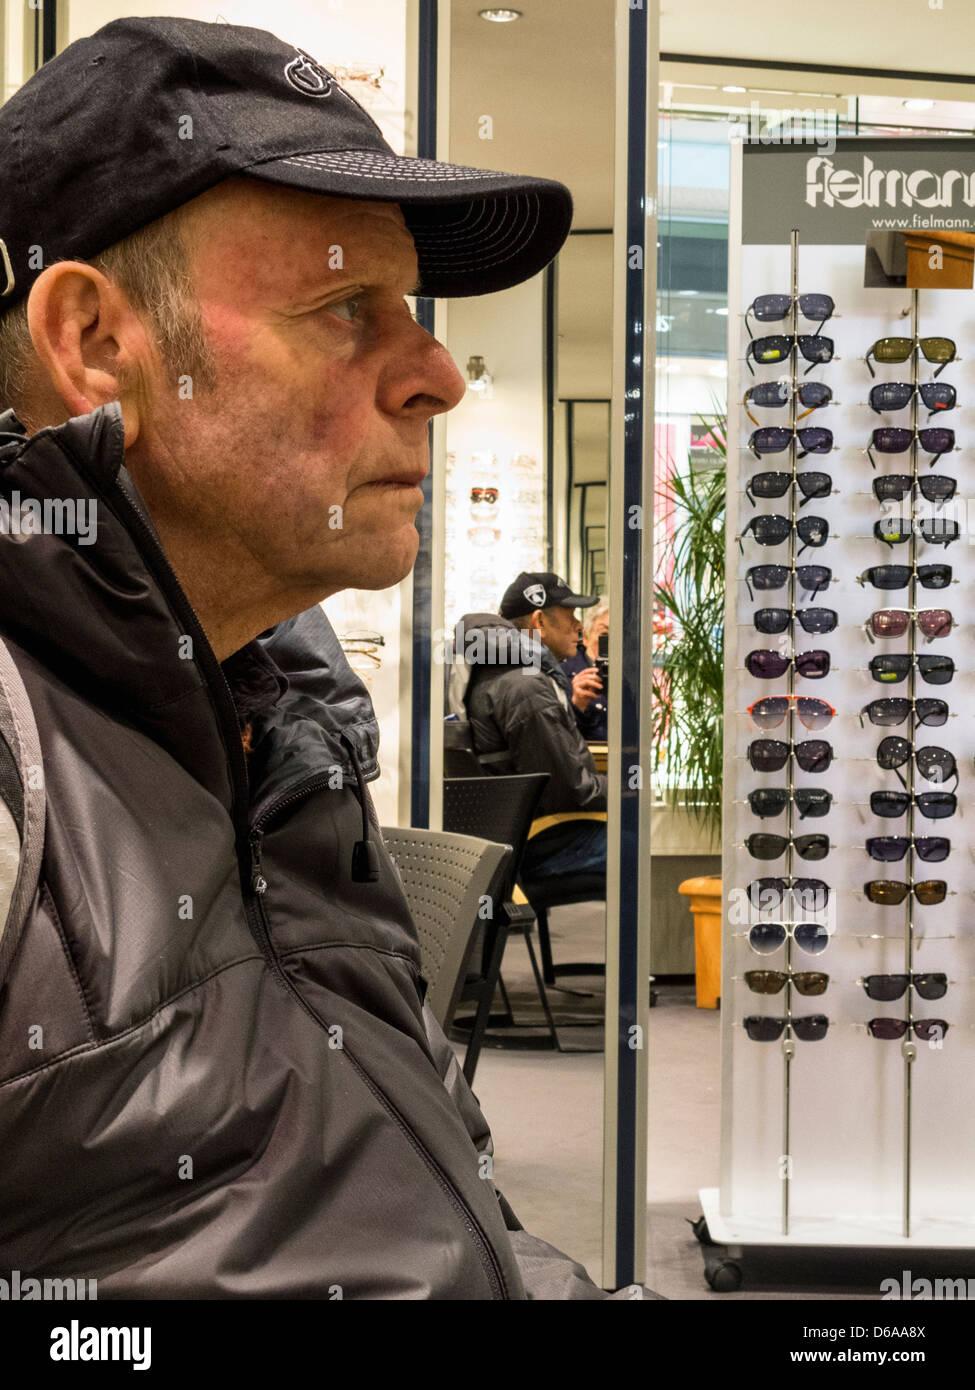 Senior man waiting for an optician - Stock Image